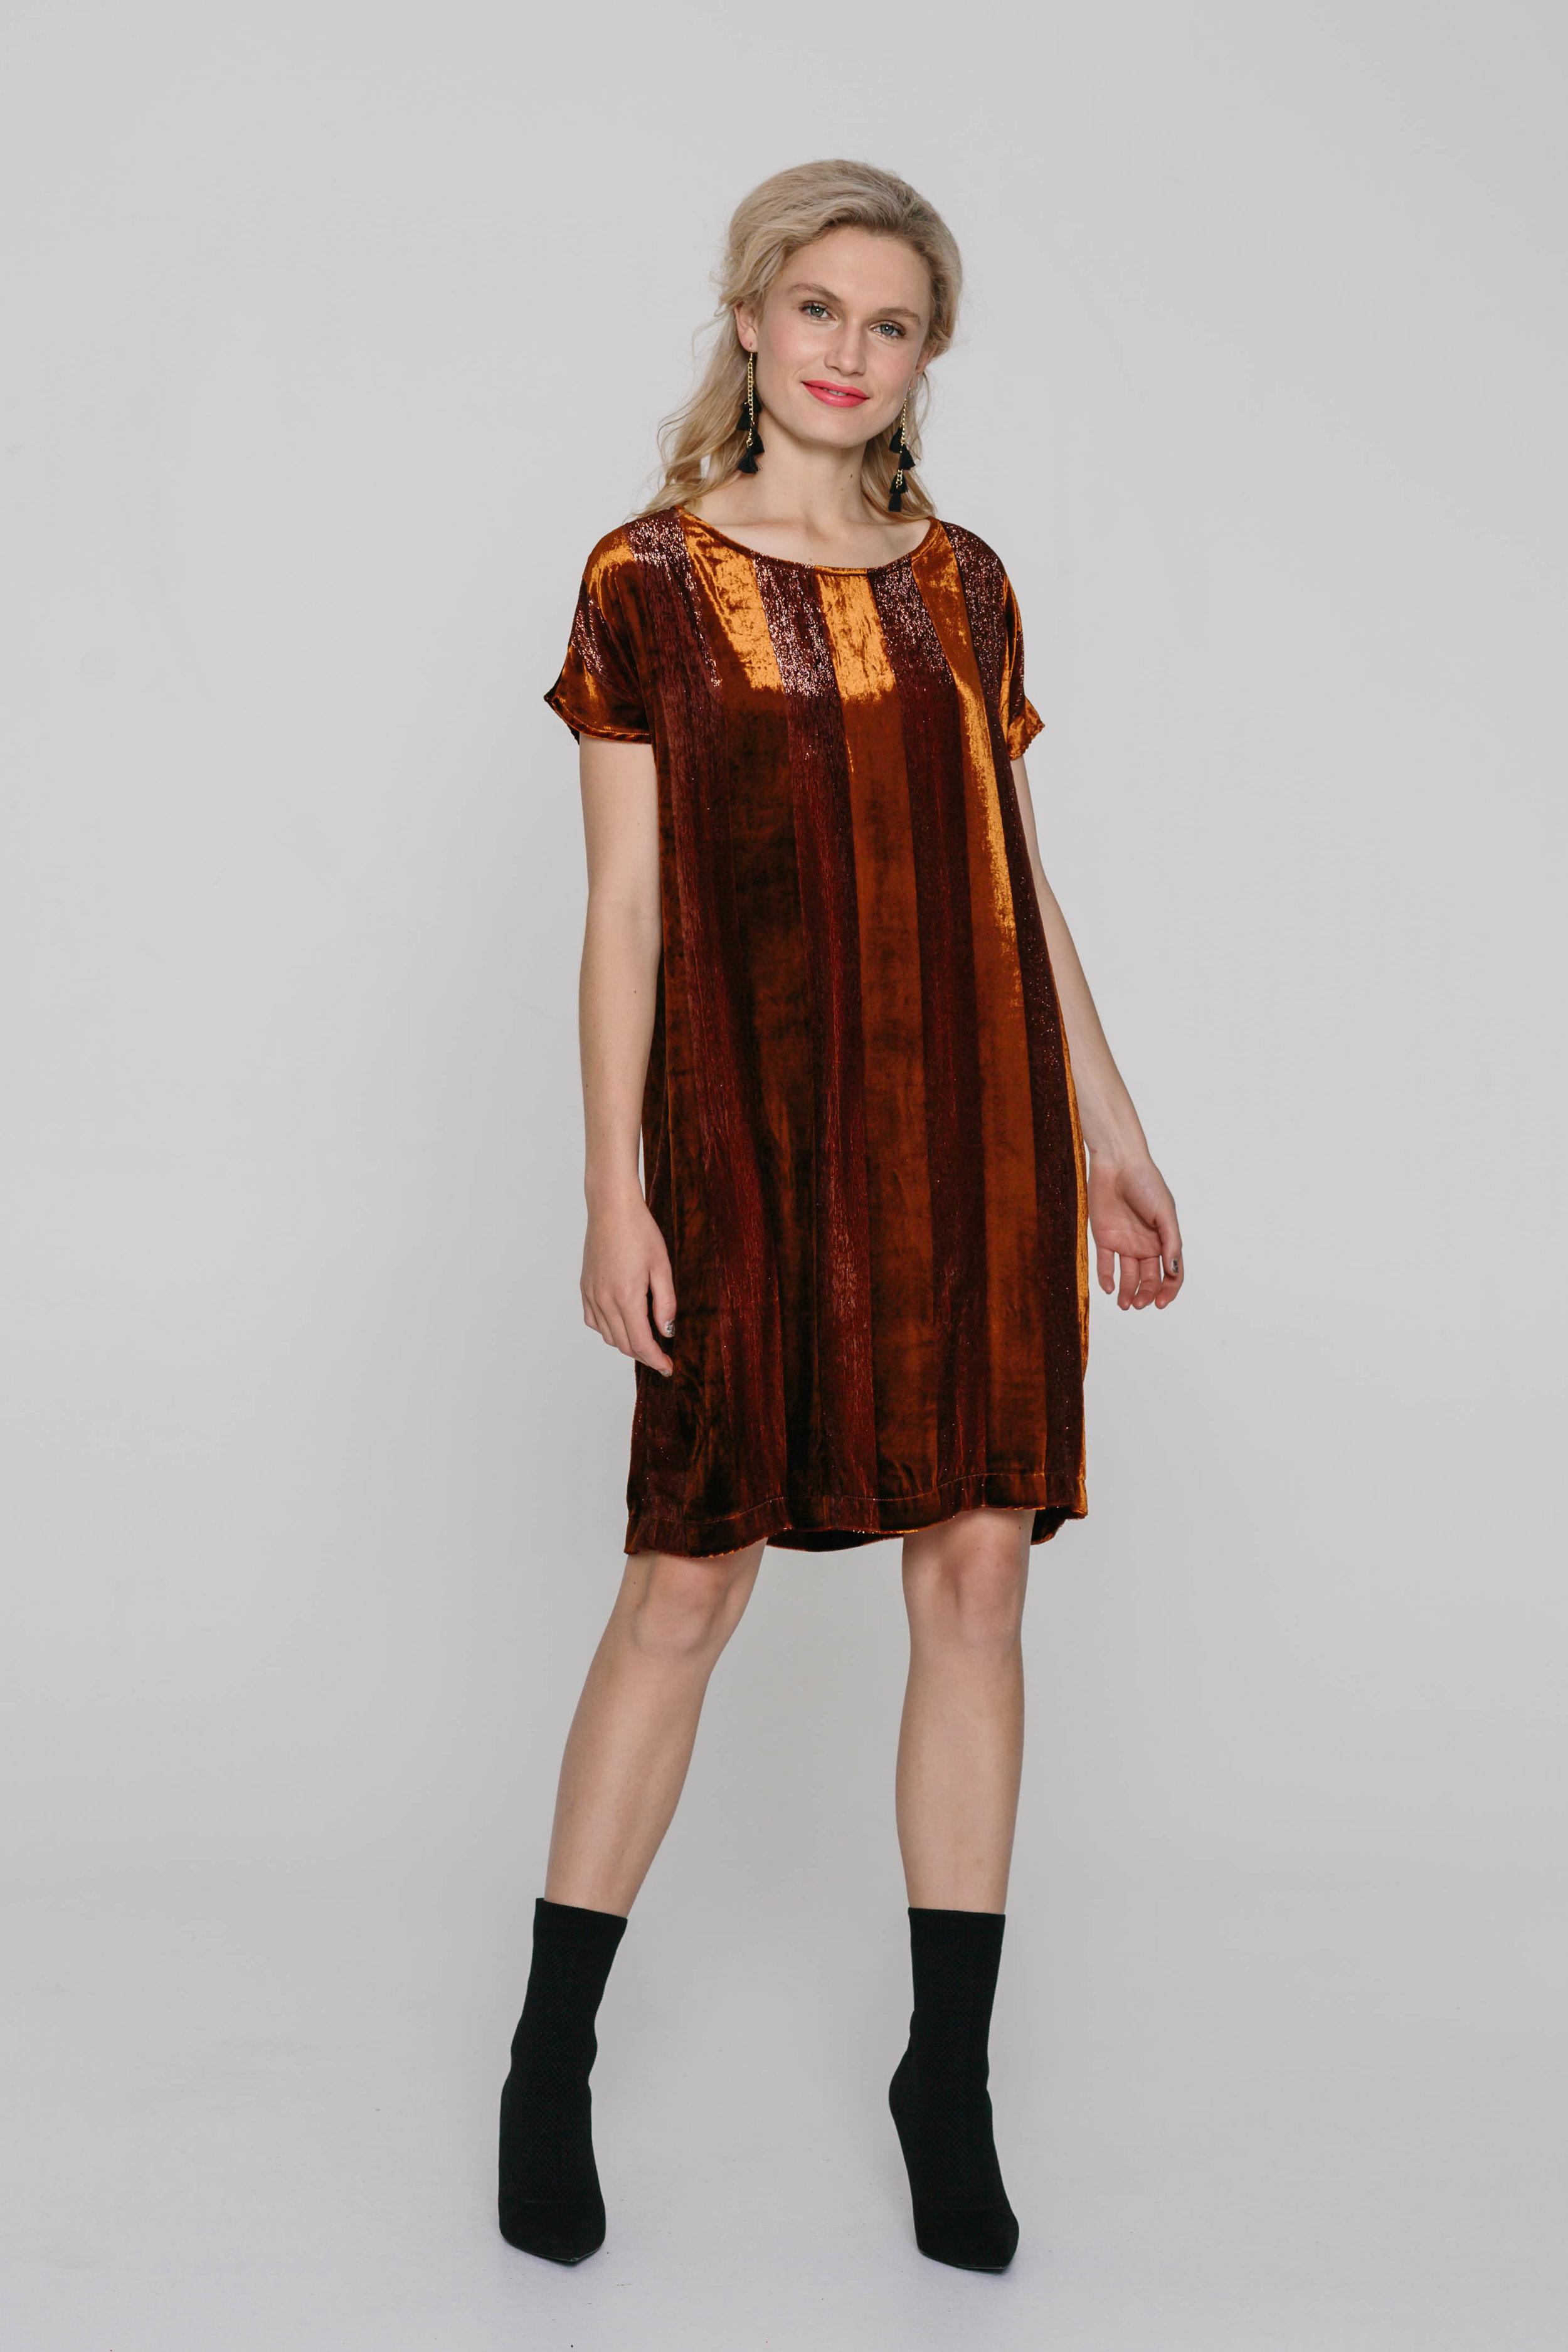 5474WA The Dress Velvet Rust